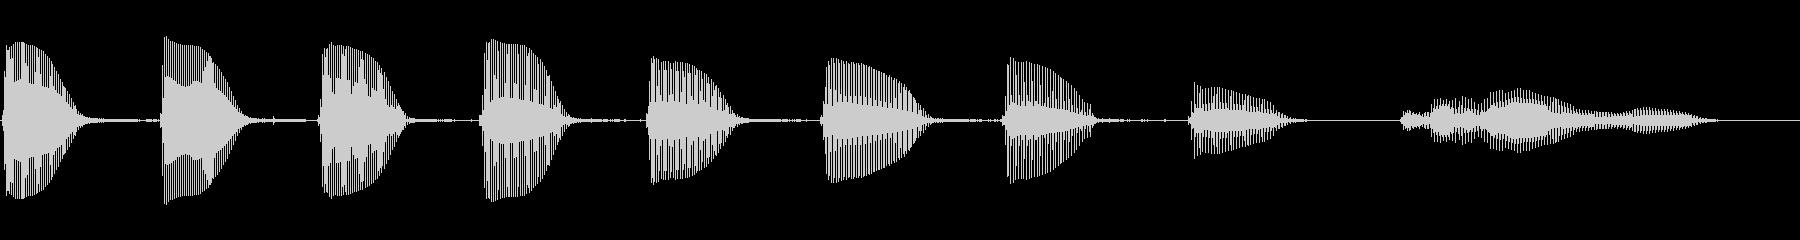 BASSOON:SLOW STOM...の未再生の波形